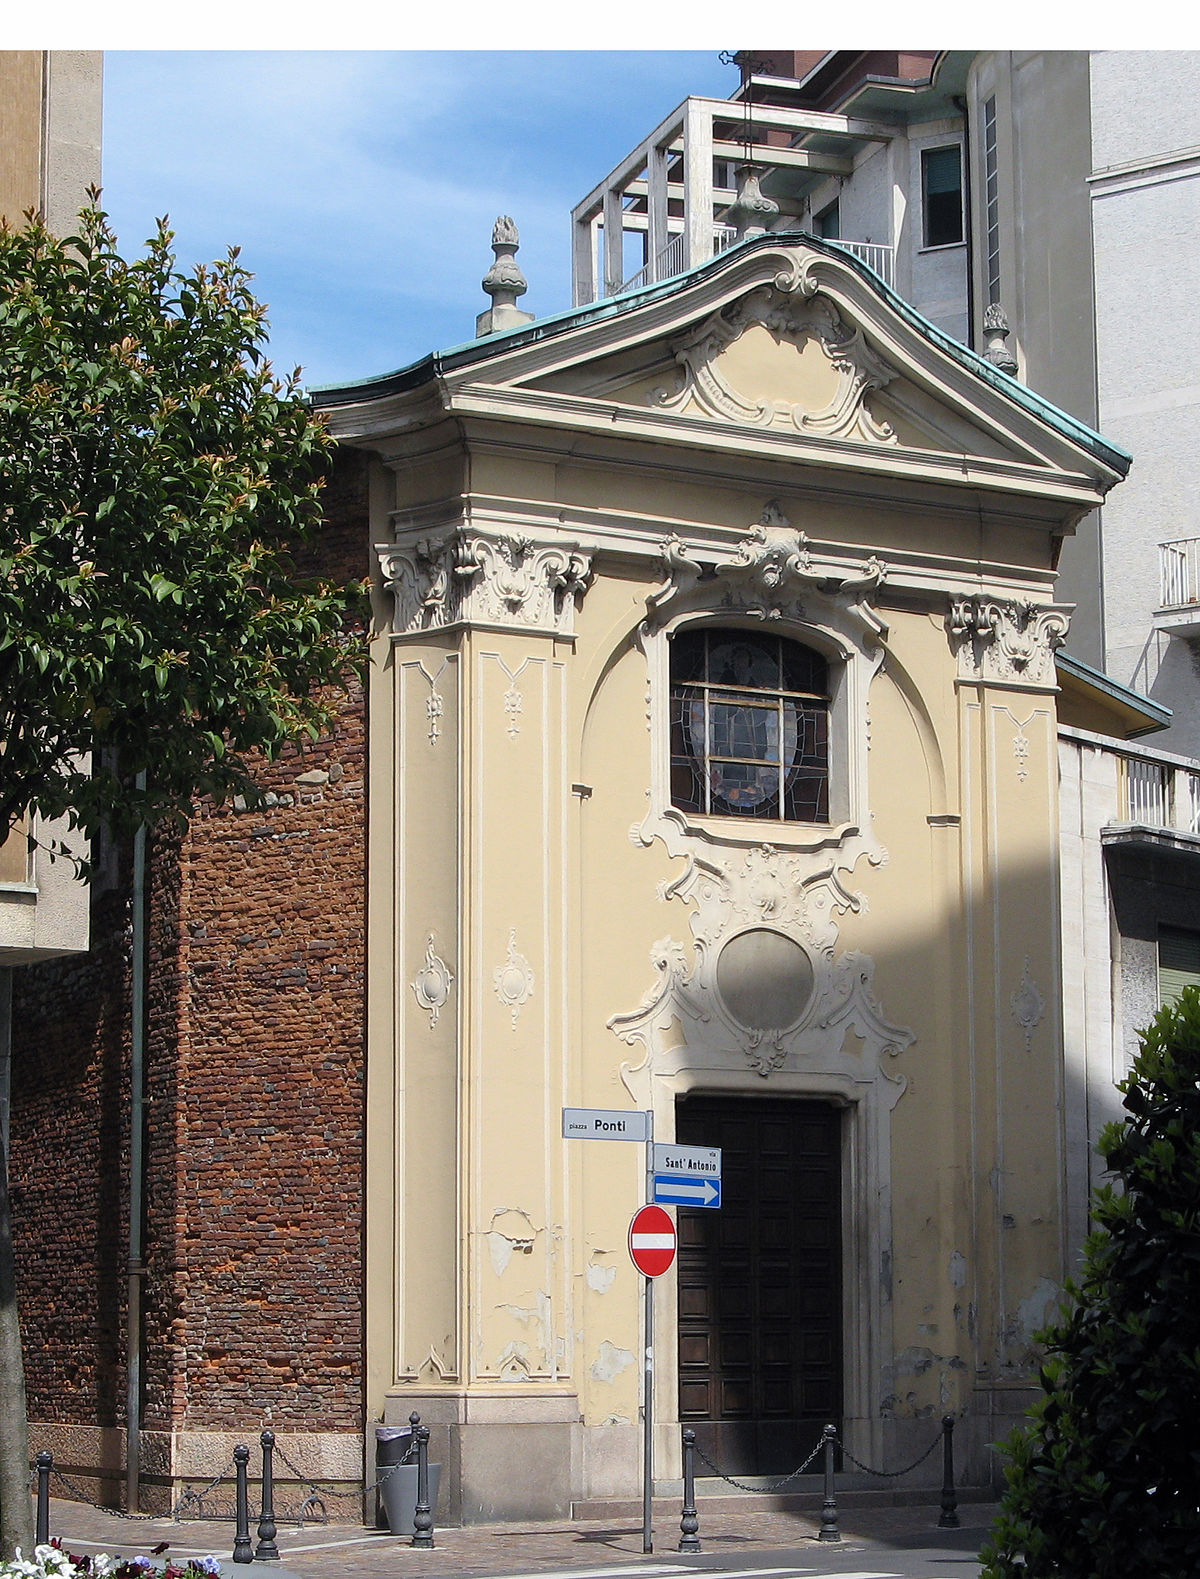 Chiesa di sant 39 antonio abate gallarate wikipedia for Arredo bimbo sant antonio abate